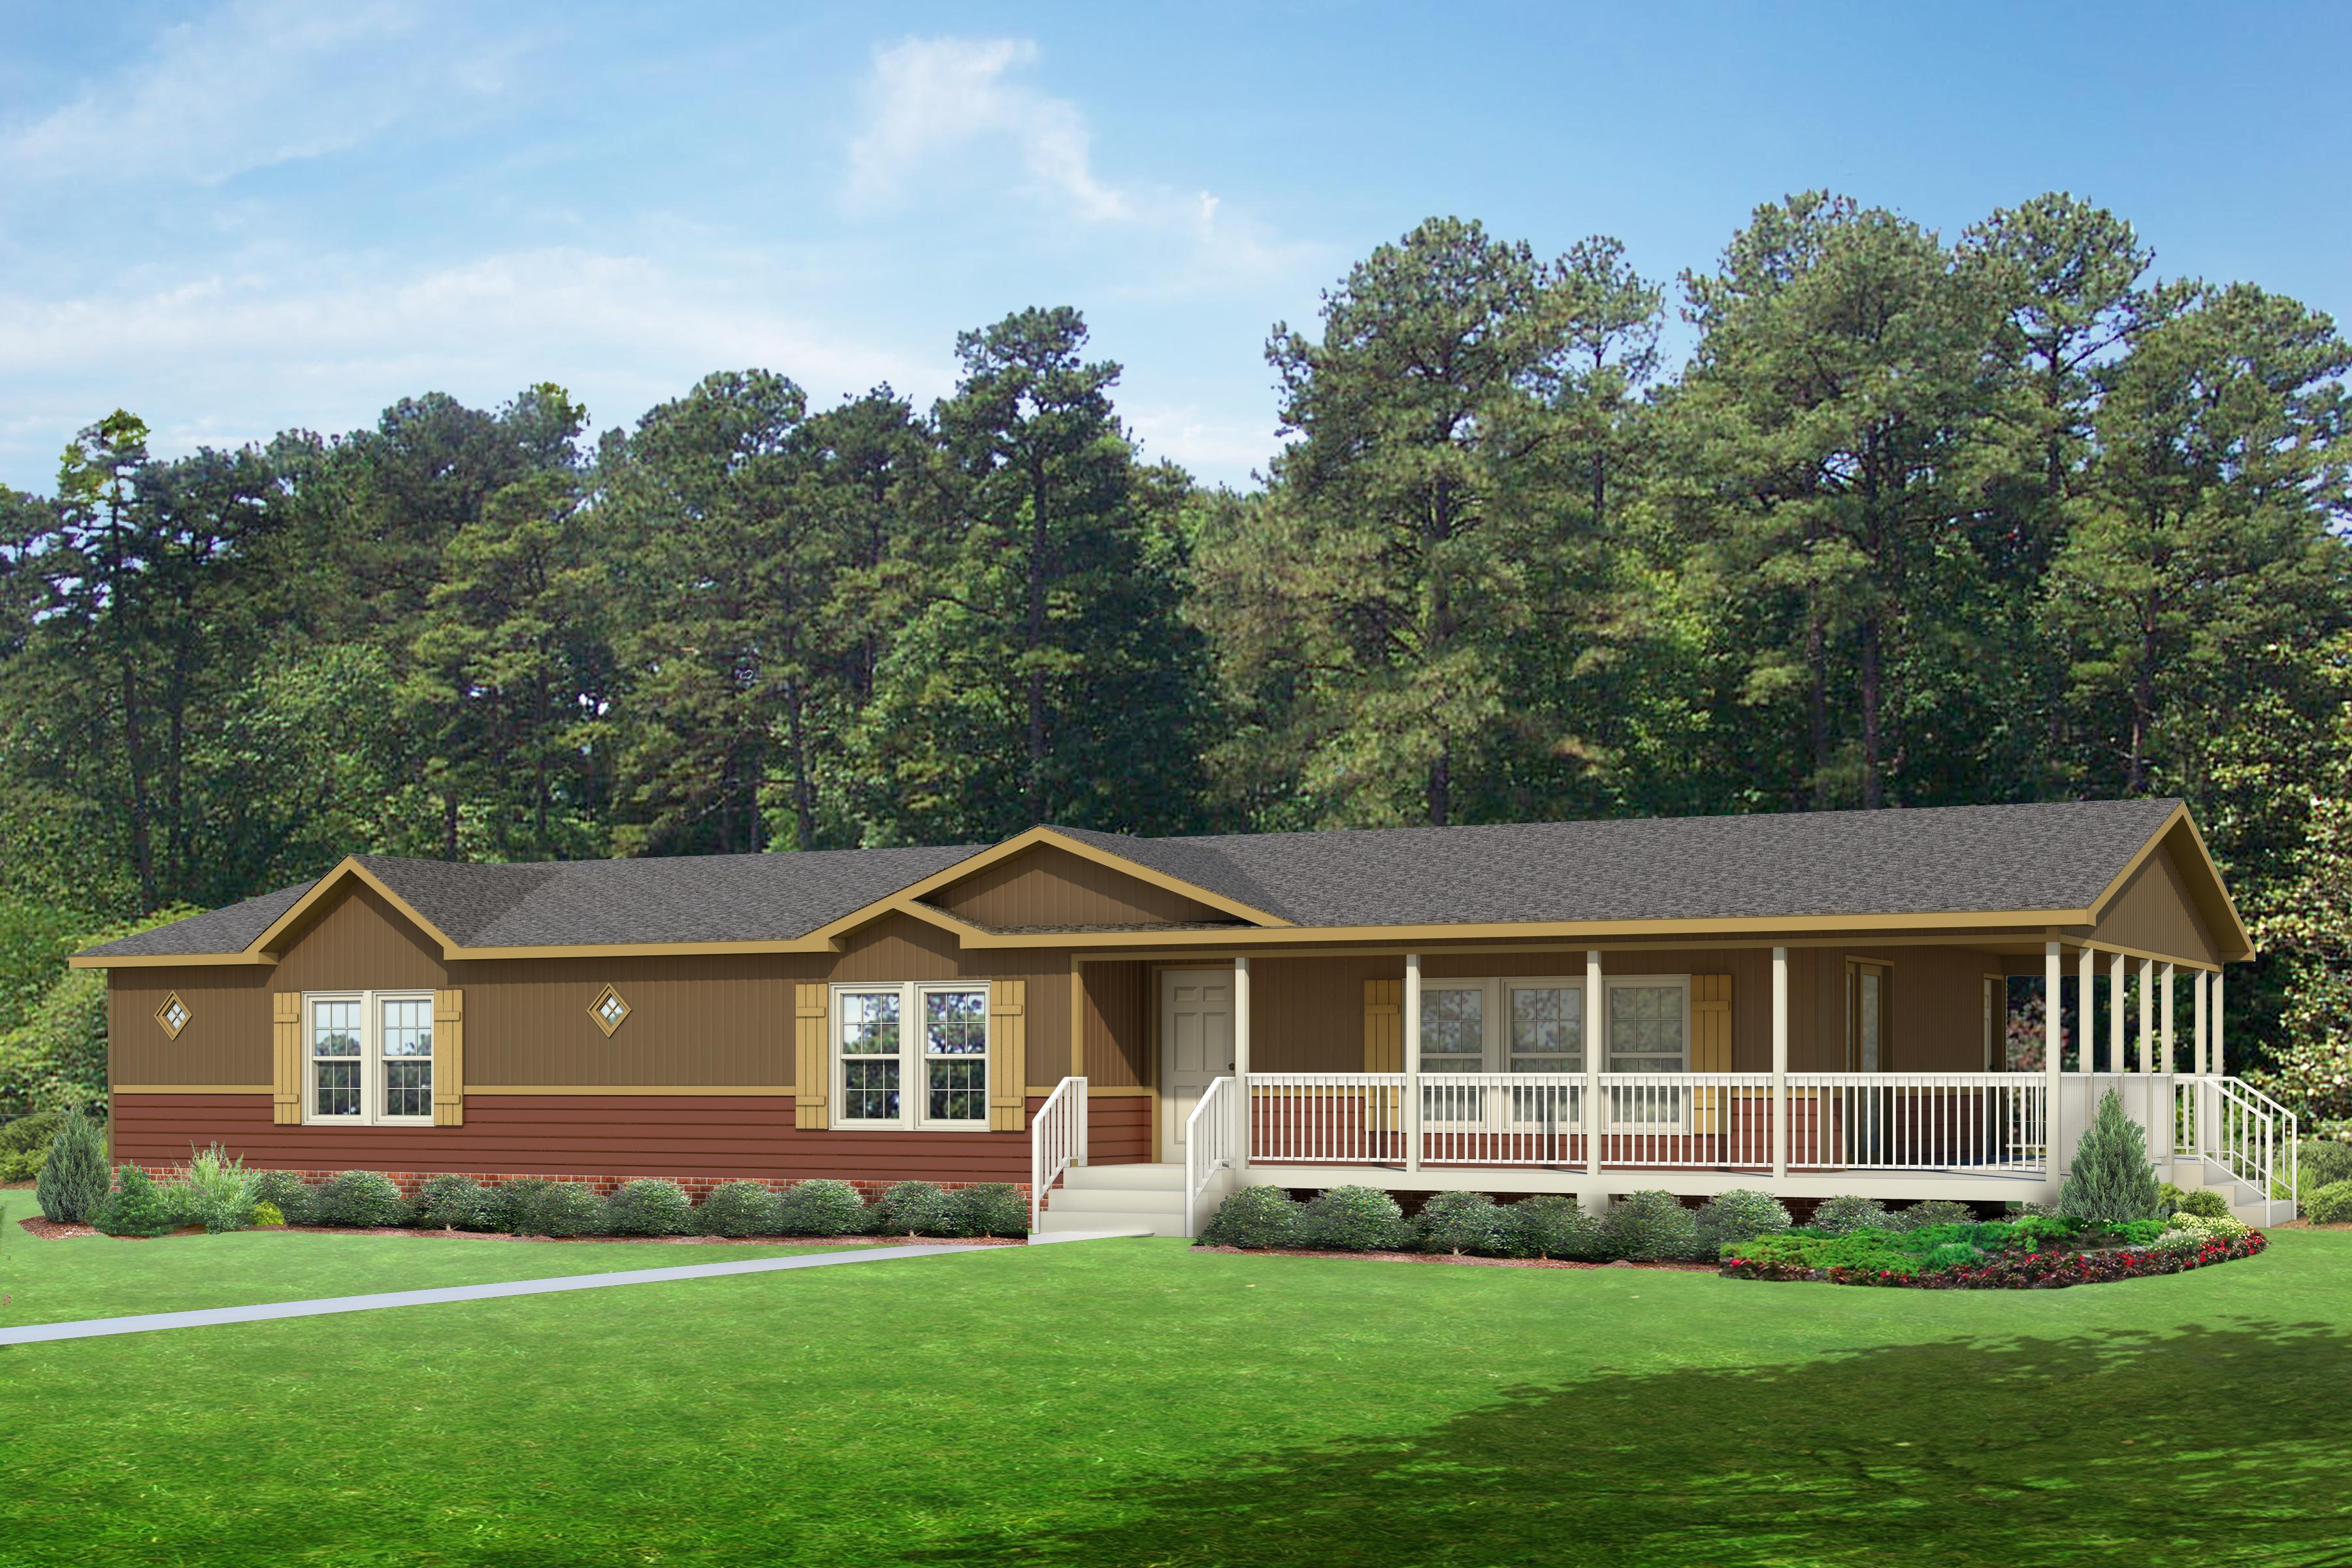 Clayton homes in waco tx prefabricated modular for Waco home builders